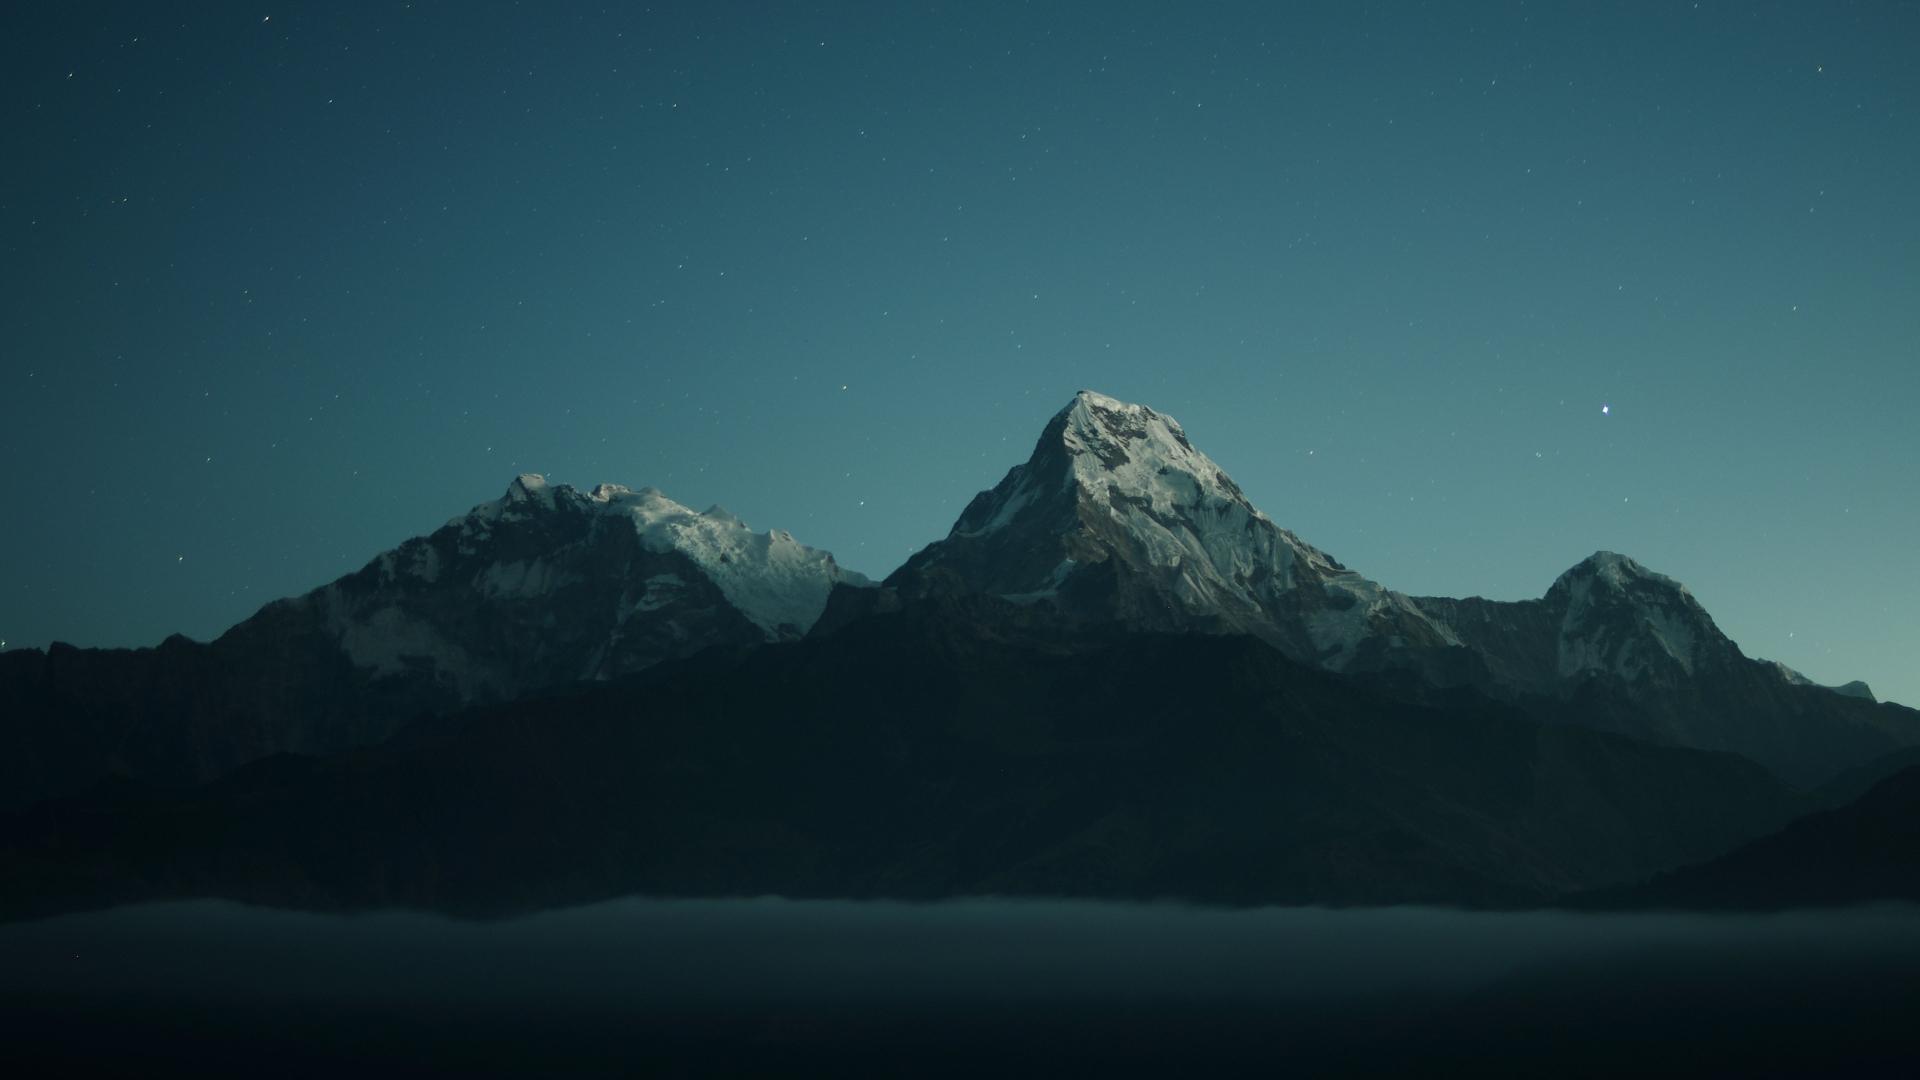 1920x1080 Mountains in Dark Night 1080P Laptop Full HD ...